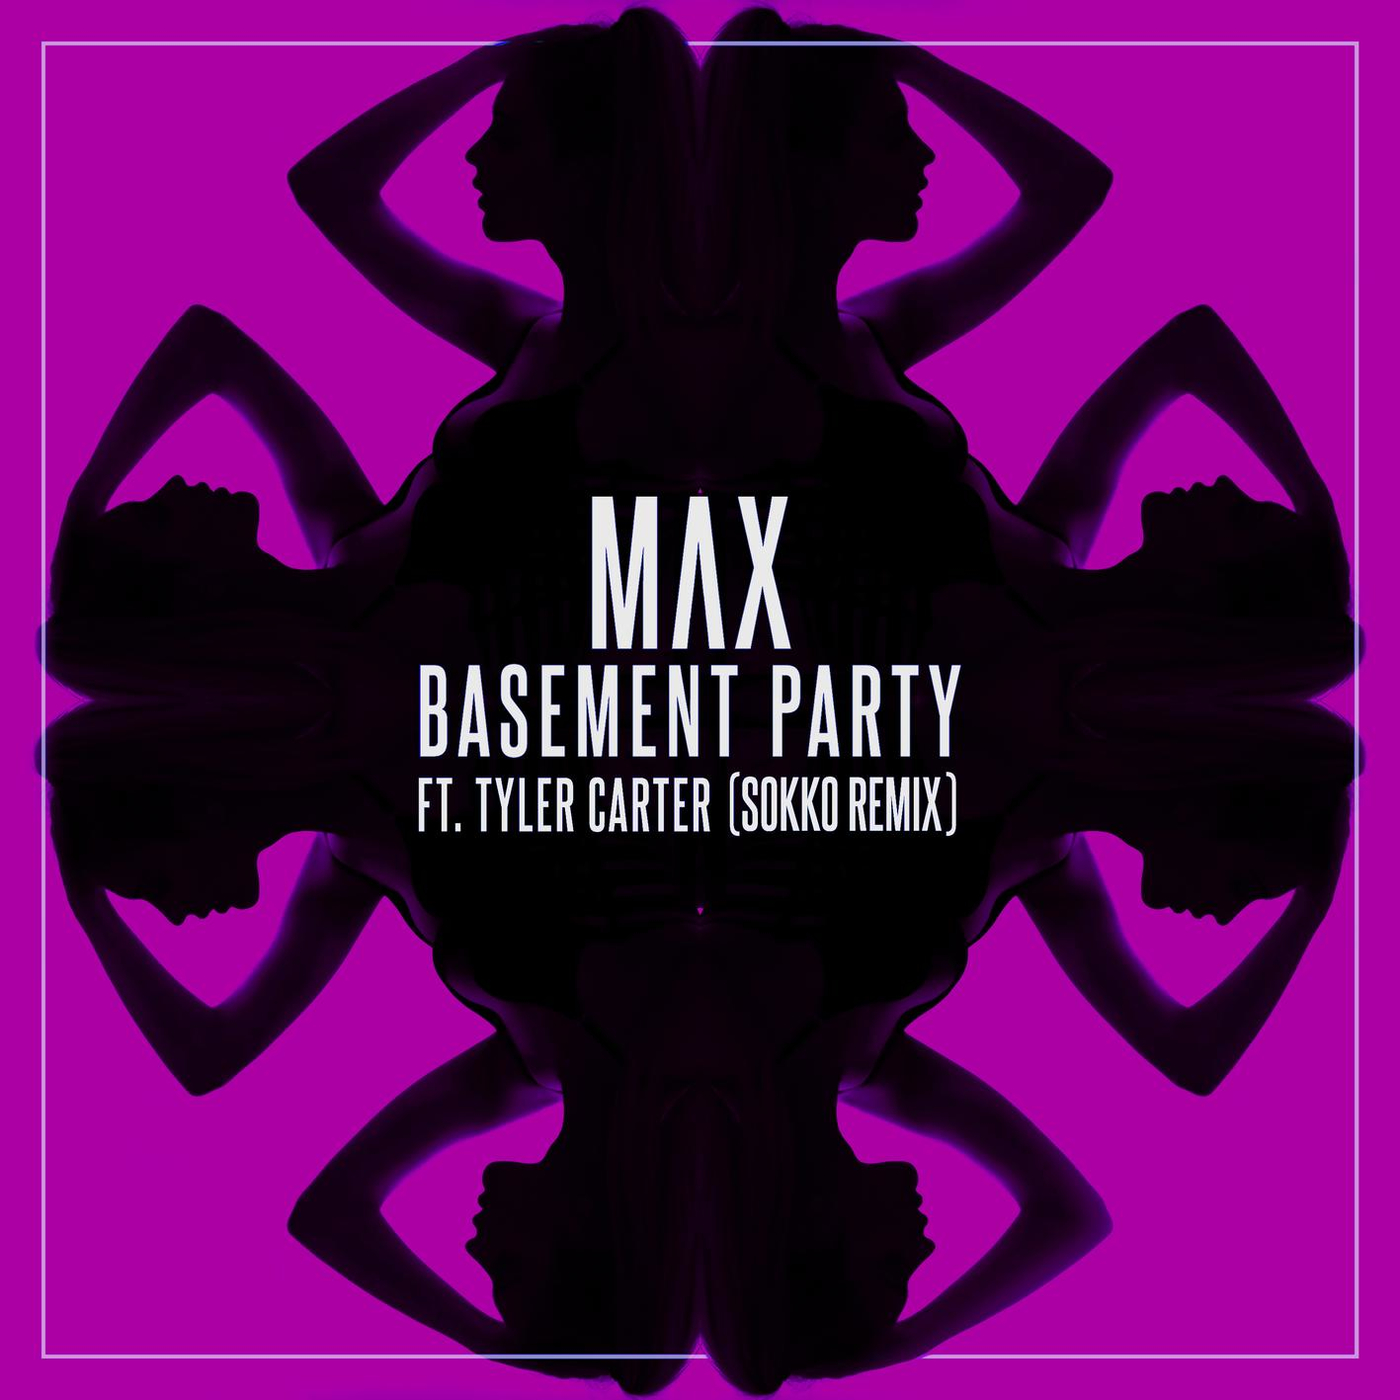 MAX feat. Tyler Carter - Basement Party [single] (2016)